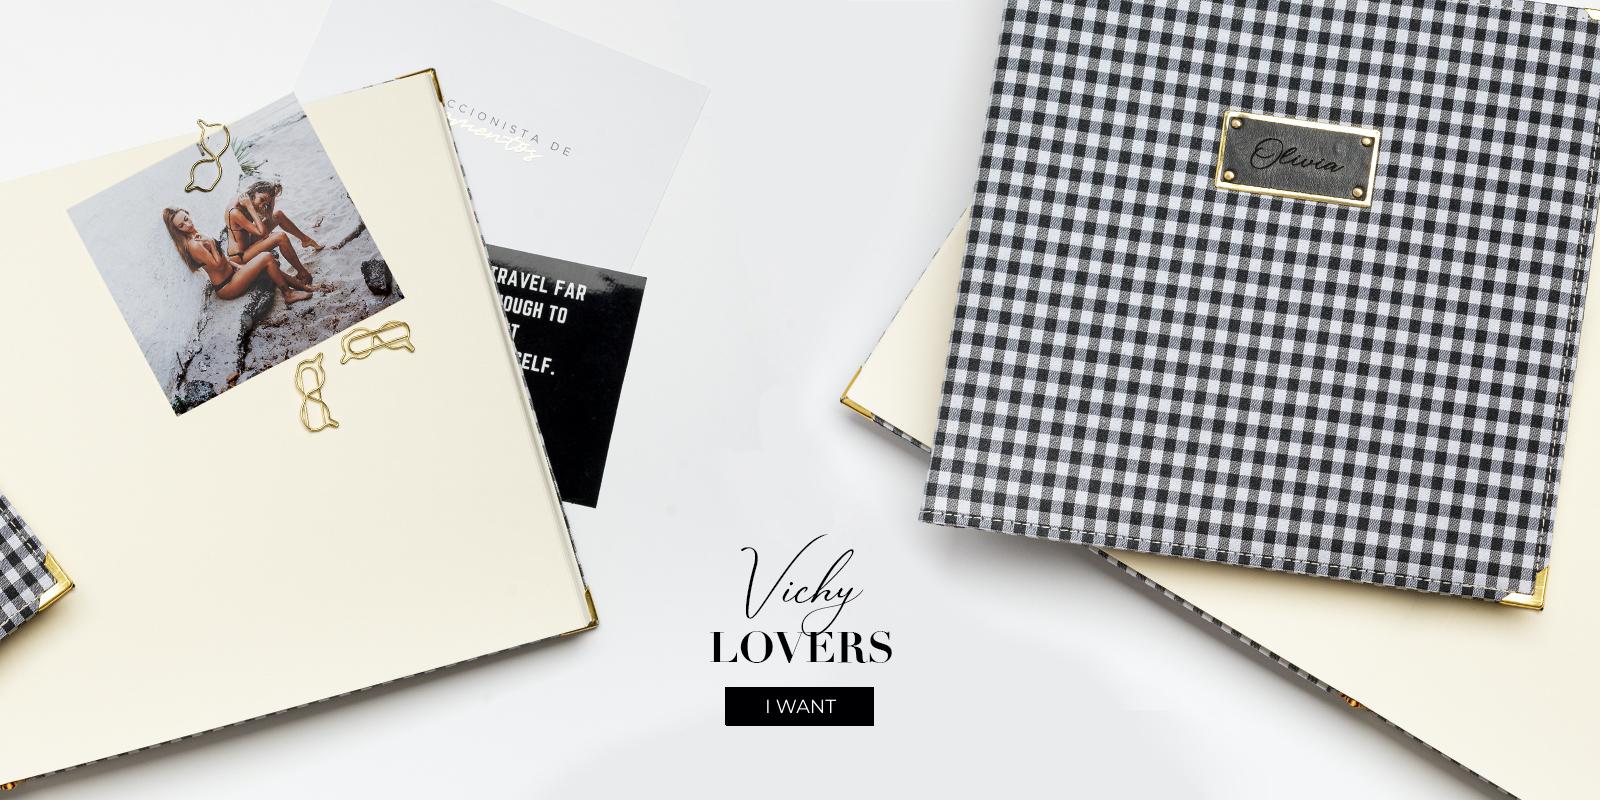 Vichy Lovers